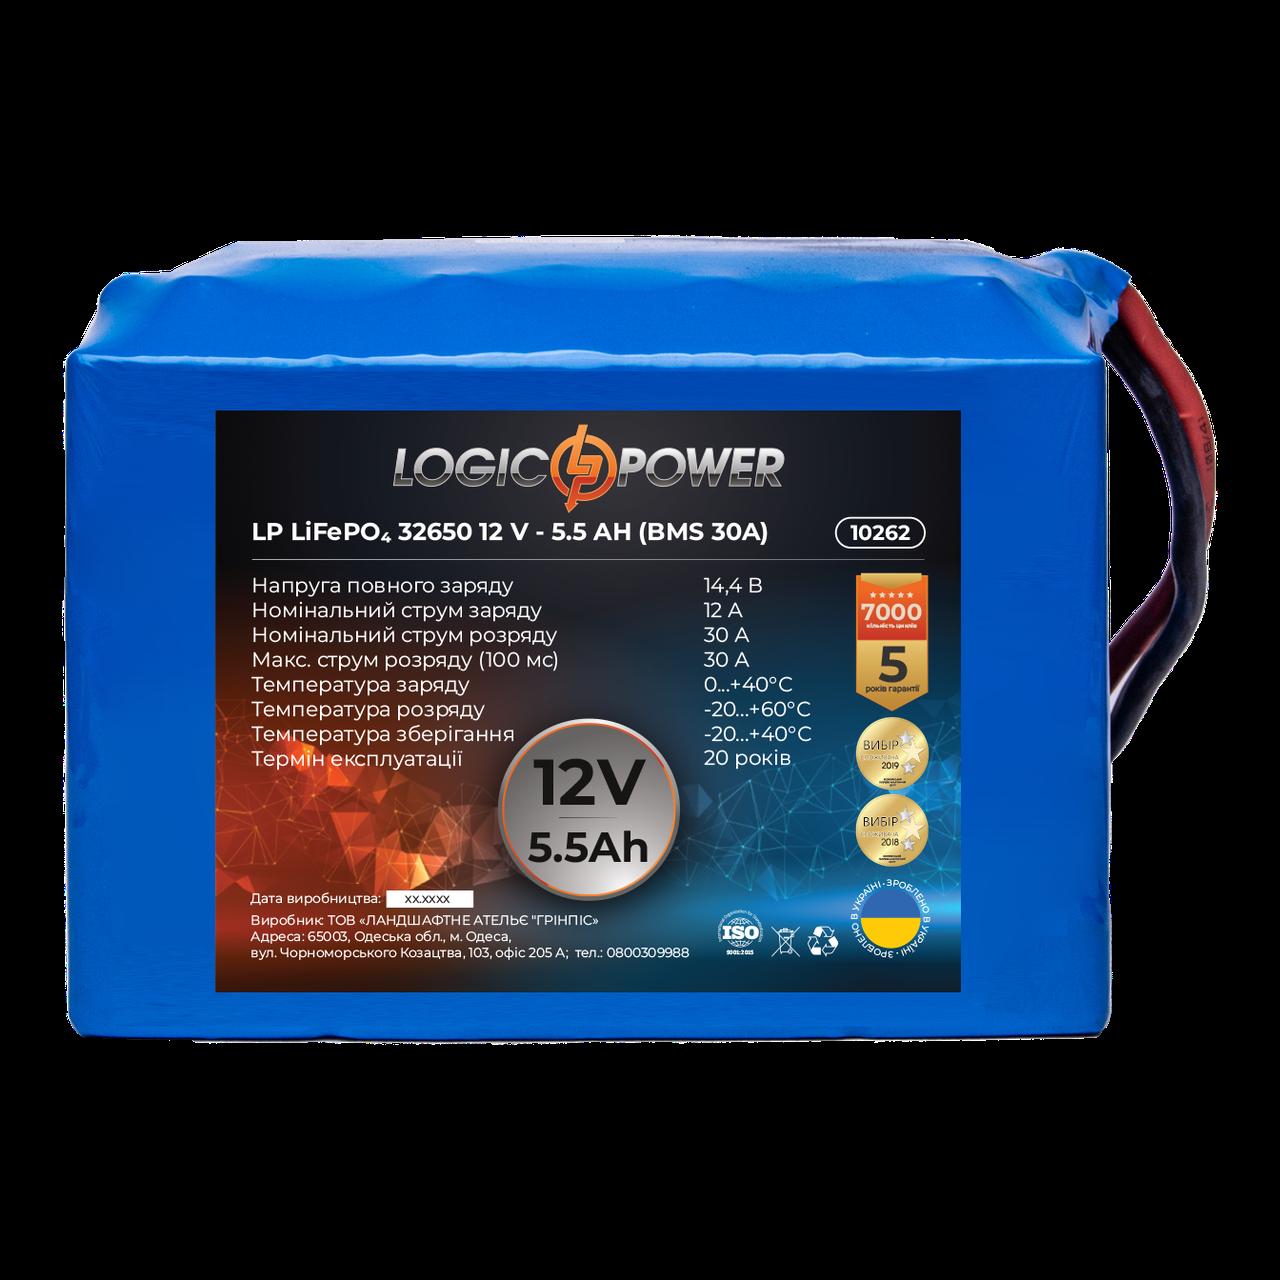 Аккумулятор LP Li-ion 18650 2.0 Ач 24V-8  Ah (BMS 20A)